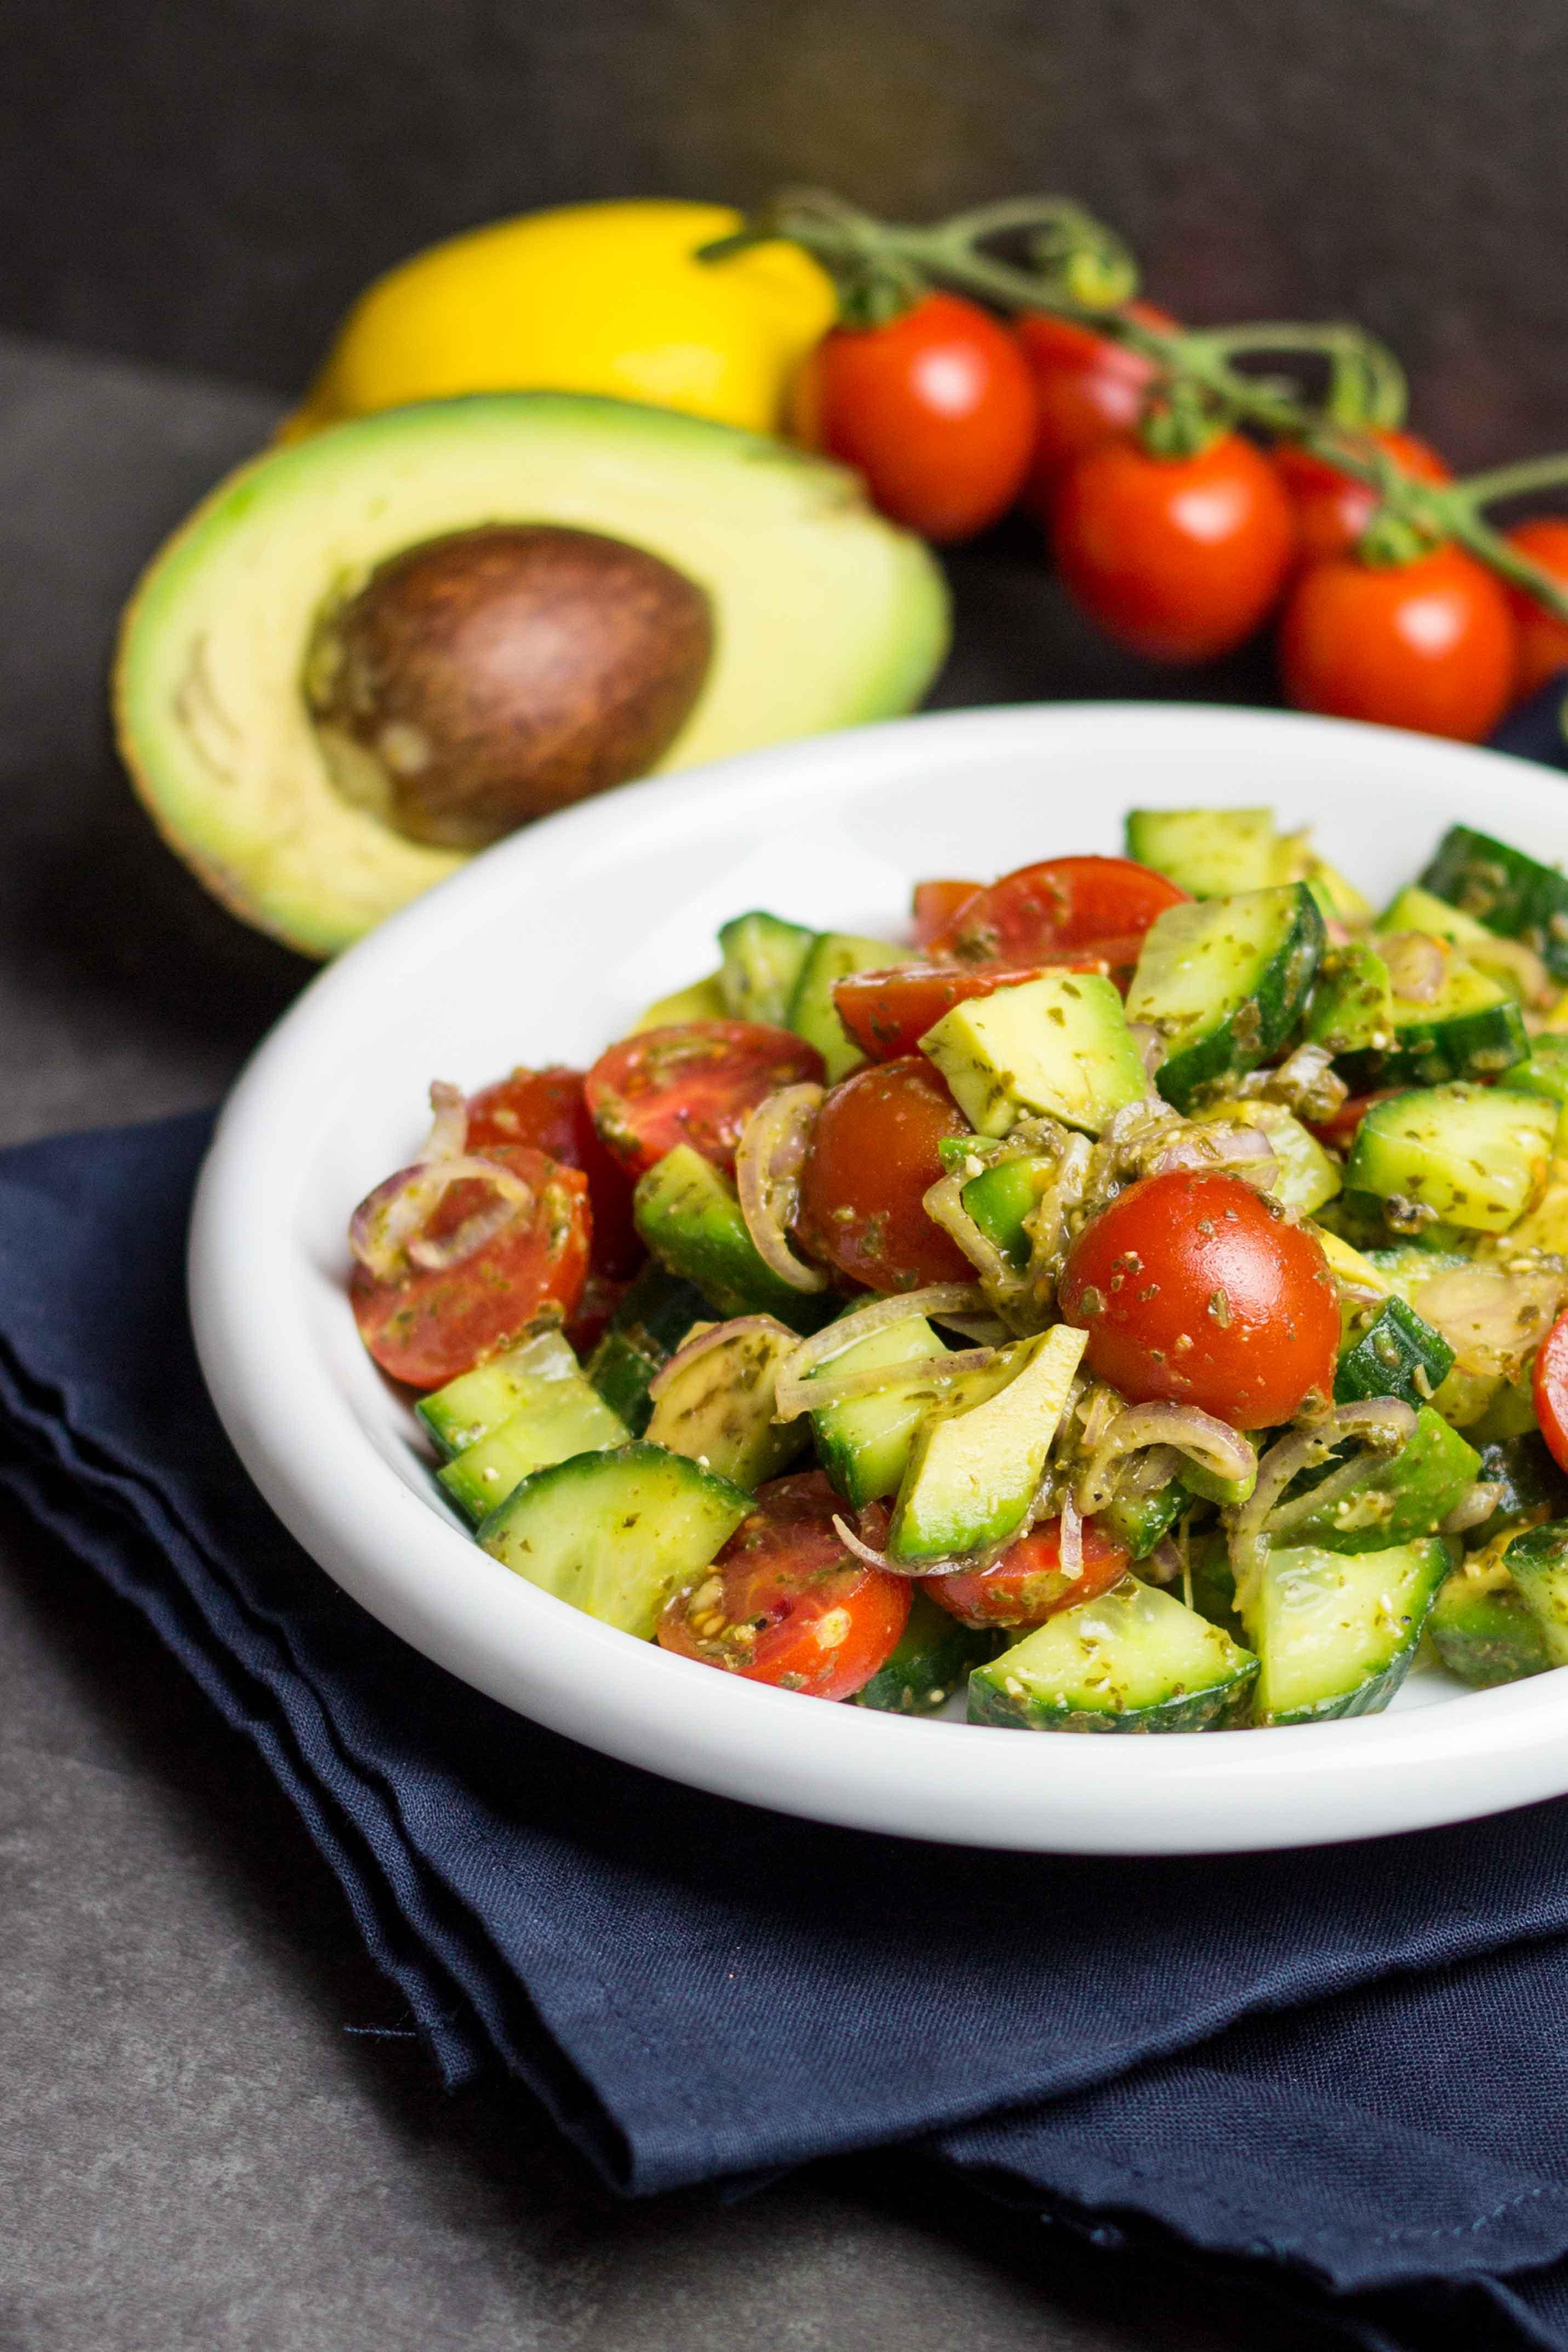 Frühstück zum Abnehmen mit Avocado